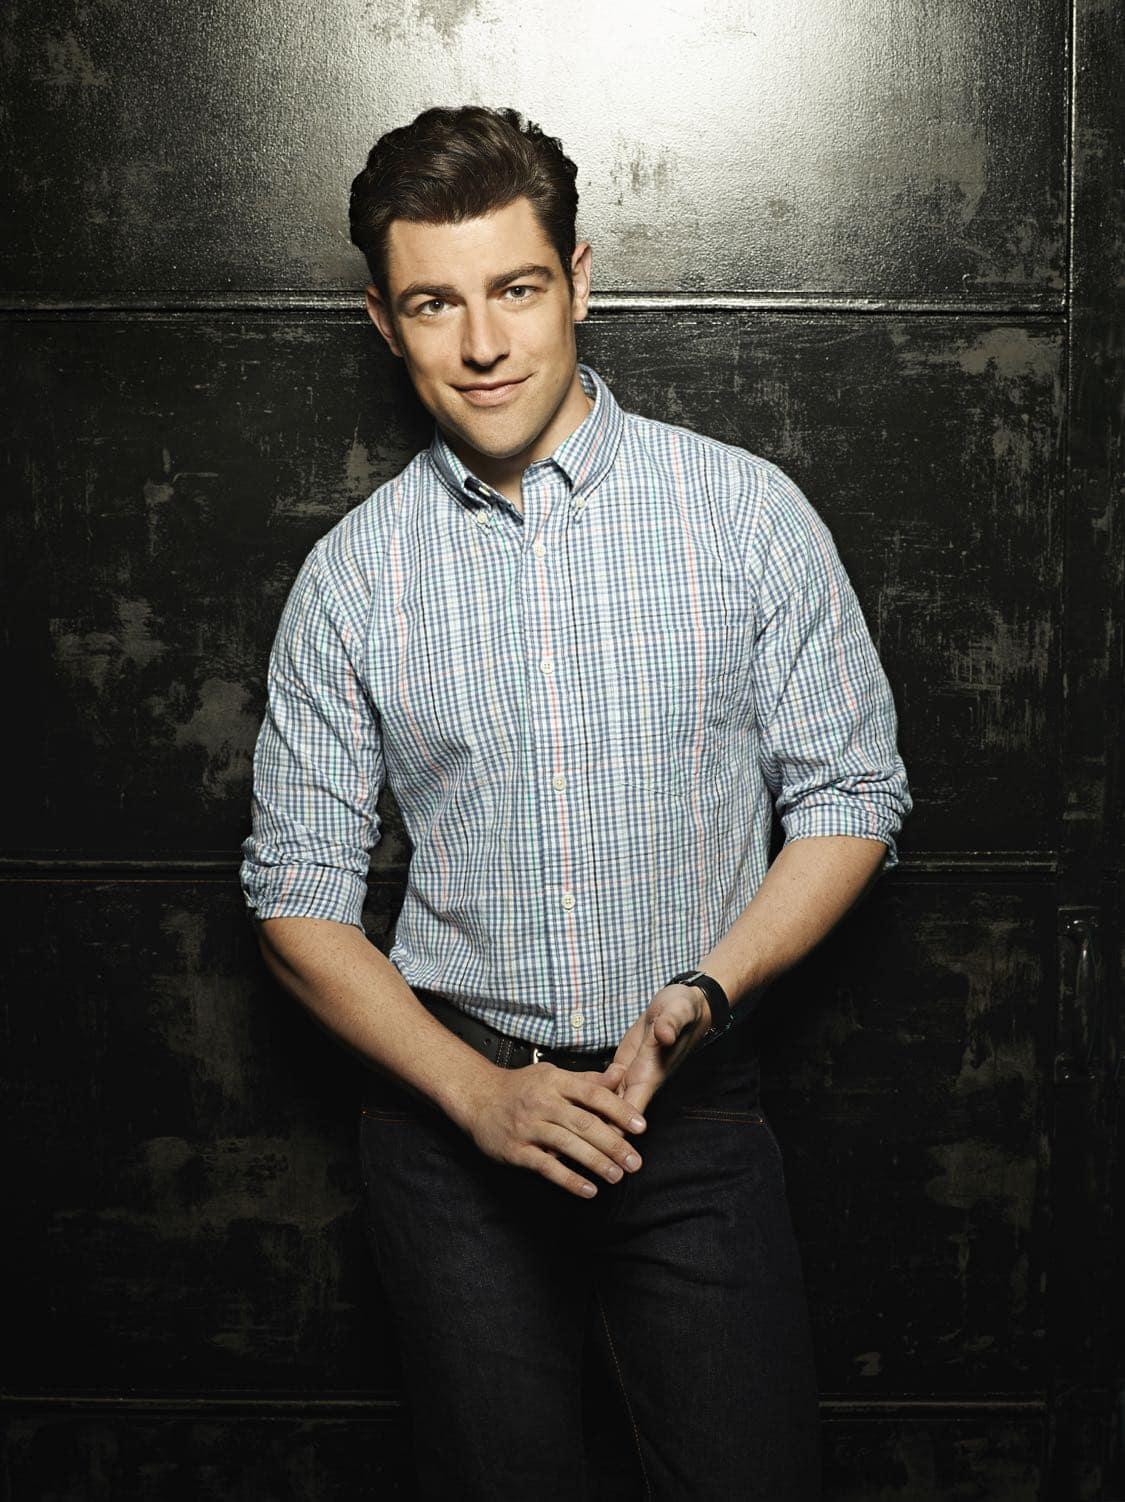 NEW GIRL: Max Greenfield returns as Schmidt. NEW GIRL premieres Tuesday, Sept. 20 (8:30-9:00 PM ET/PT) on FOX.